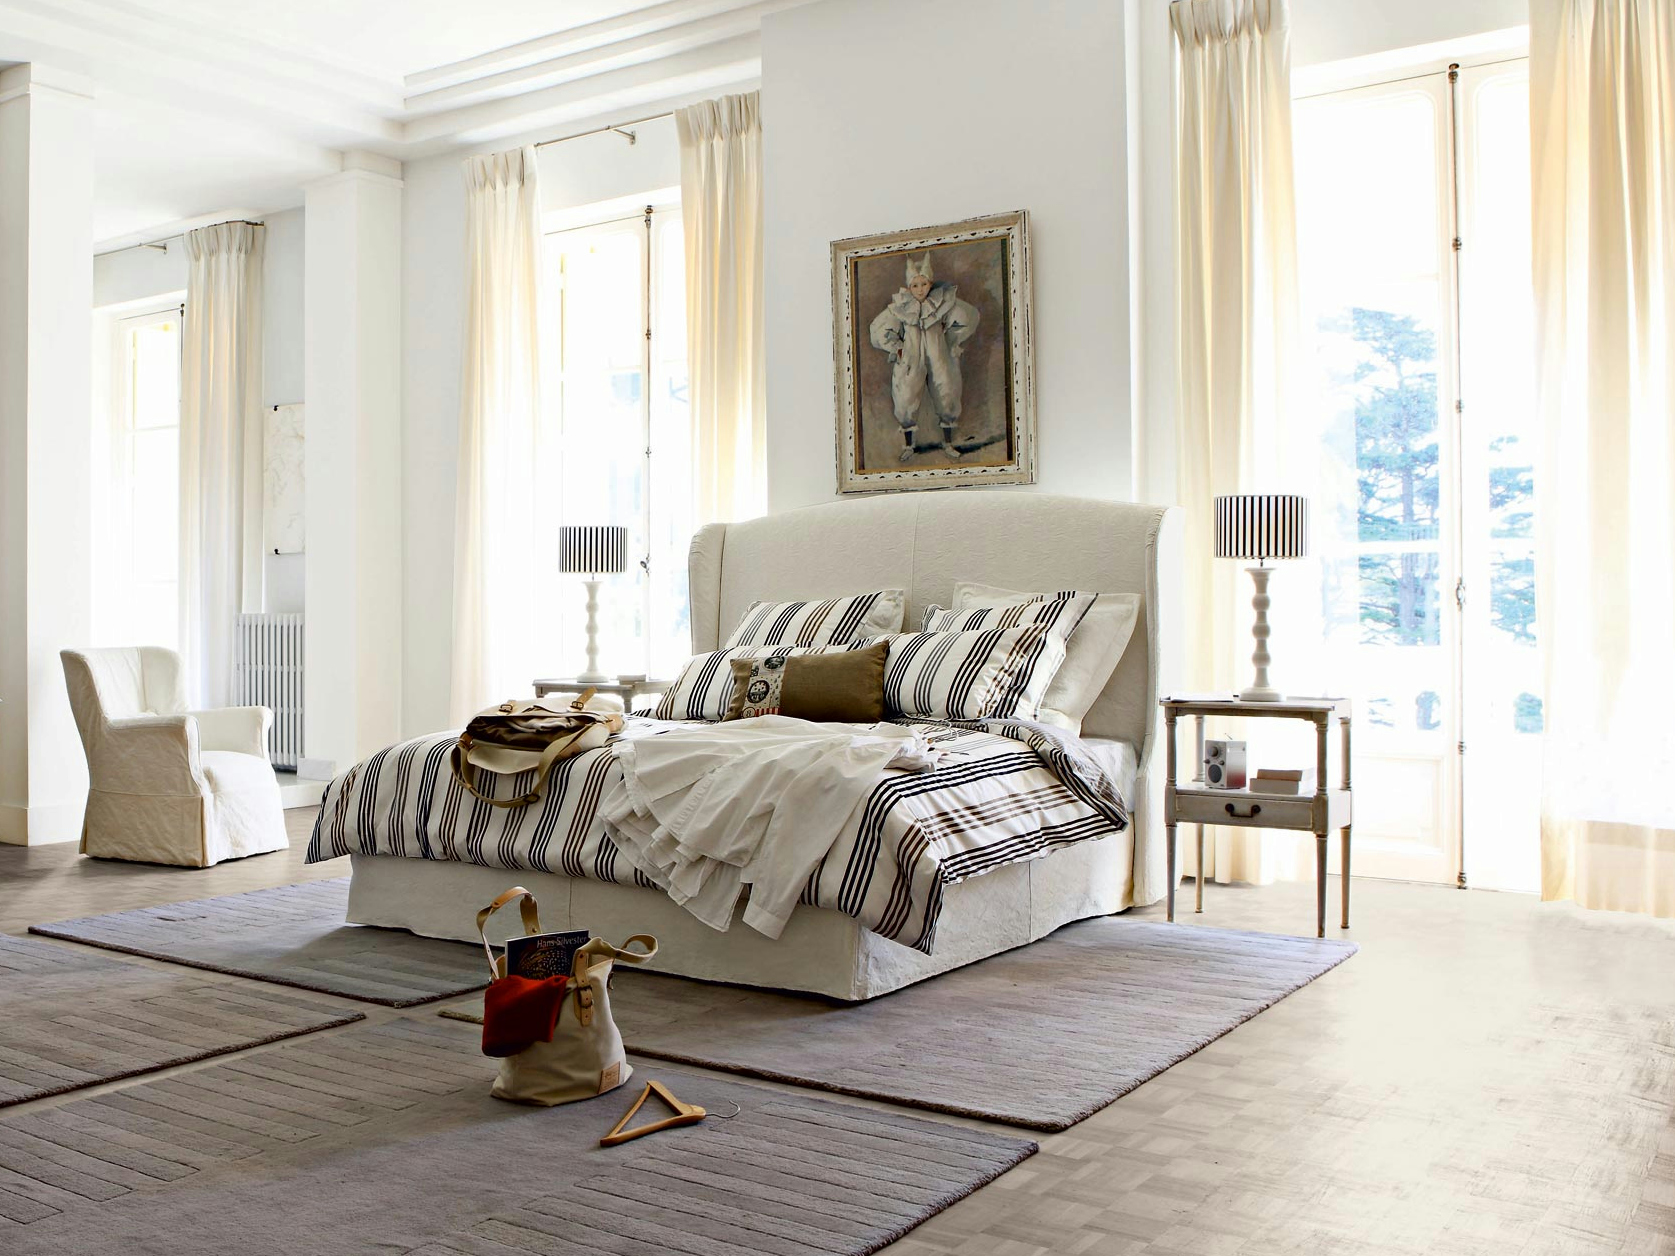 FABRIC BED WITH REMOVABLE COVER AURORE NOUVEAUX CLASSIQUES